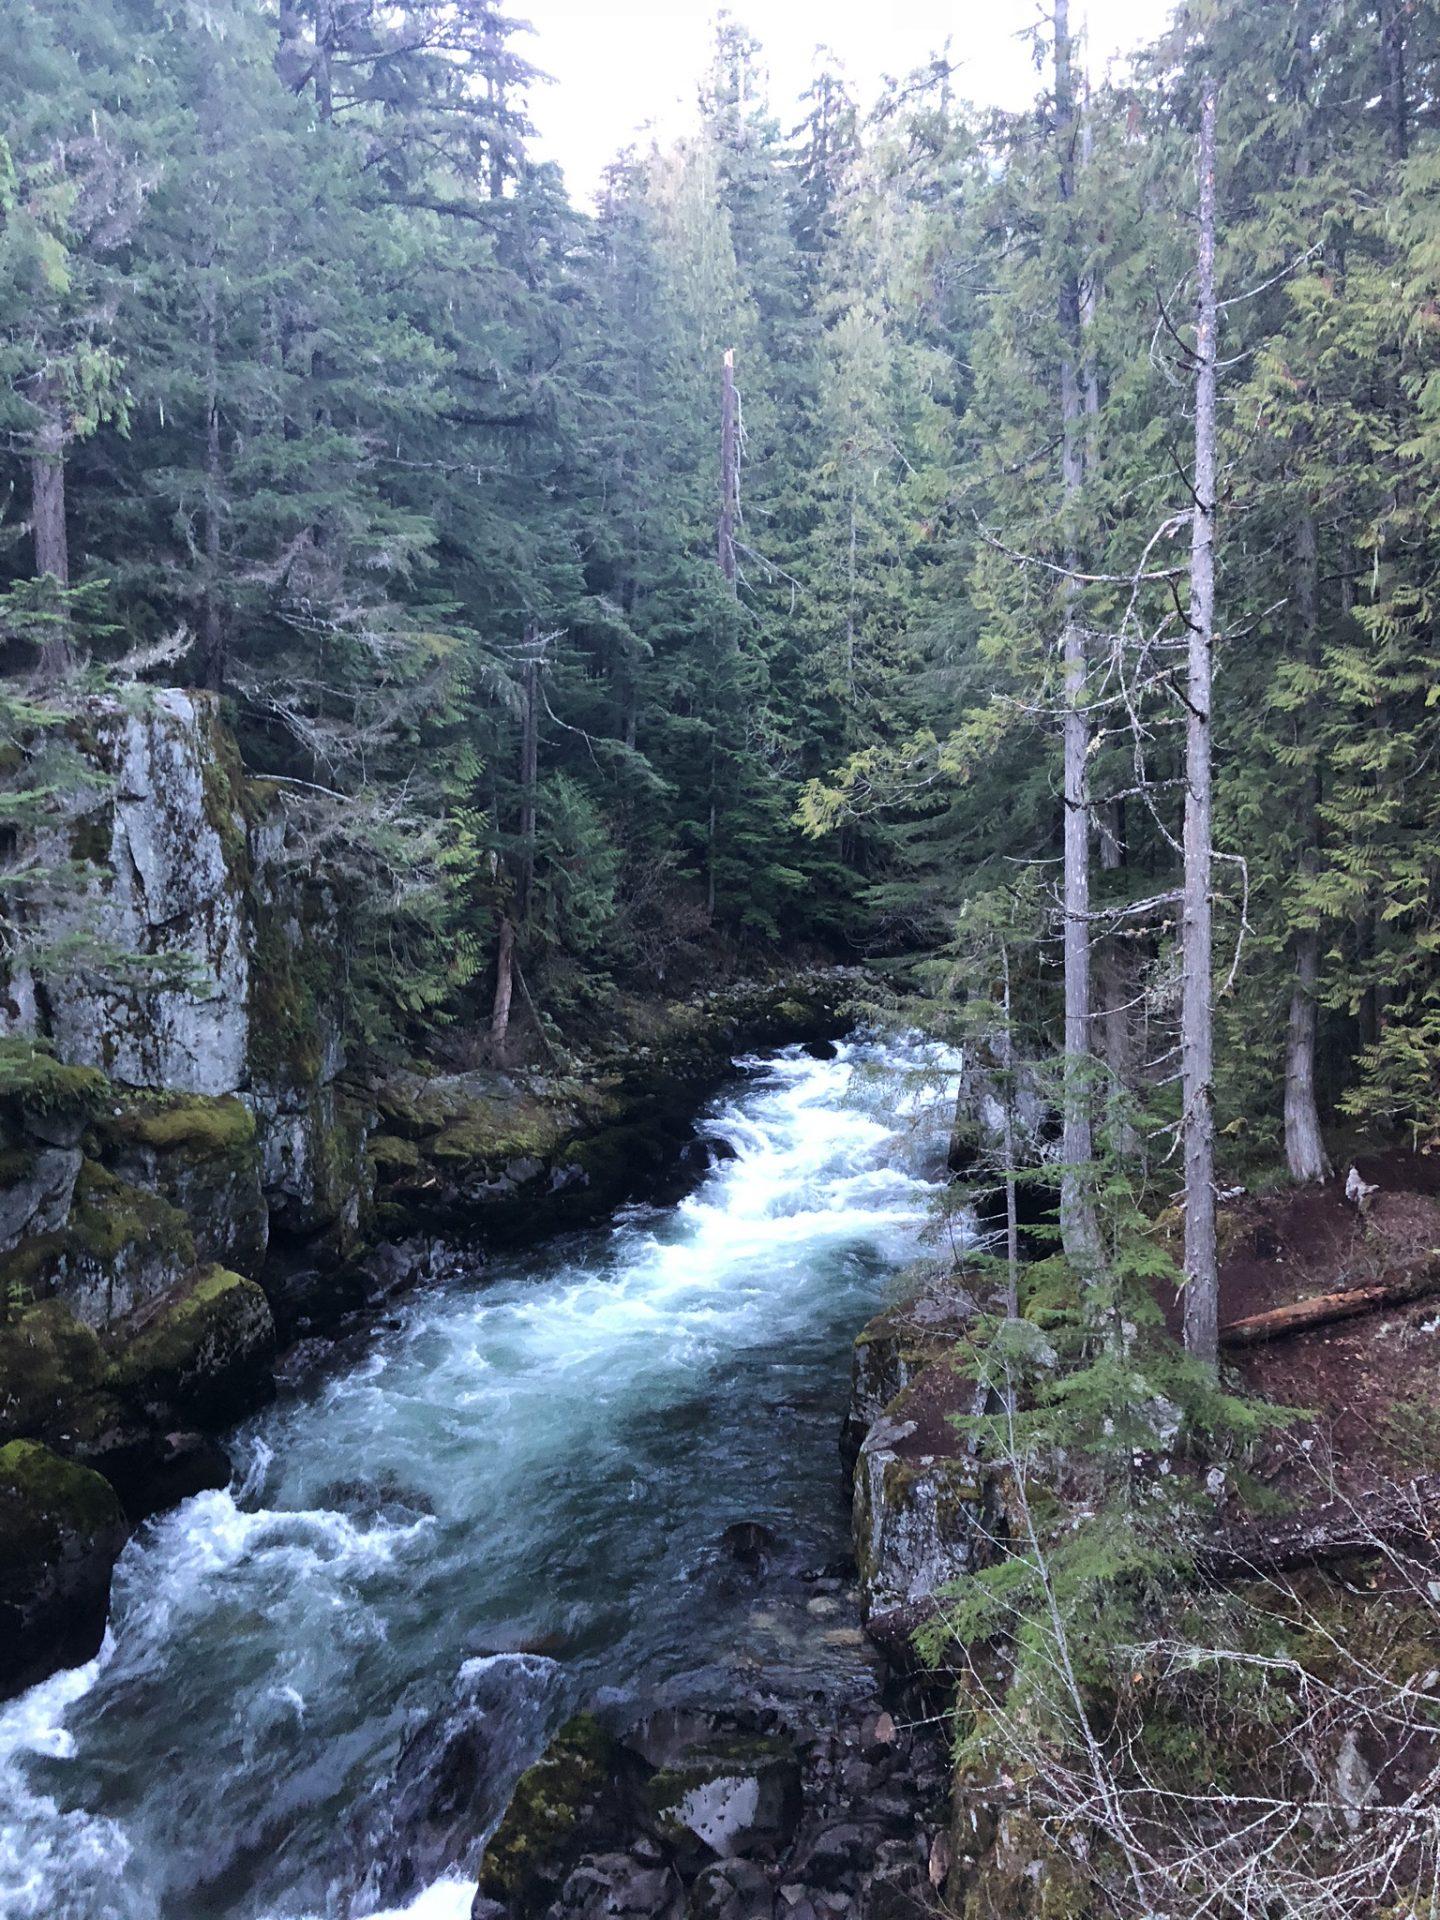 Stream at Trainwreck, Whistler